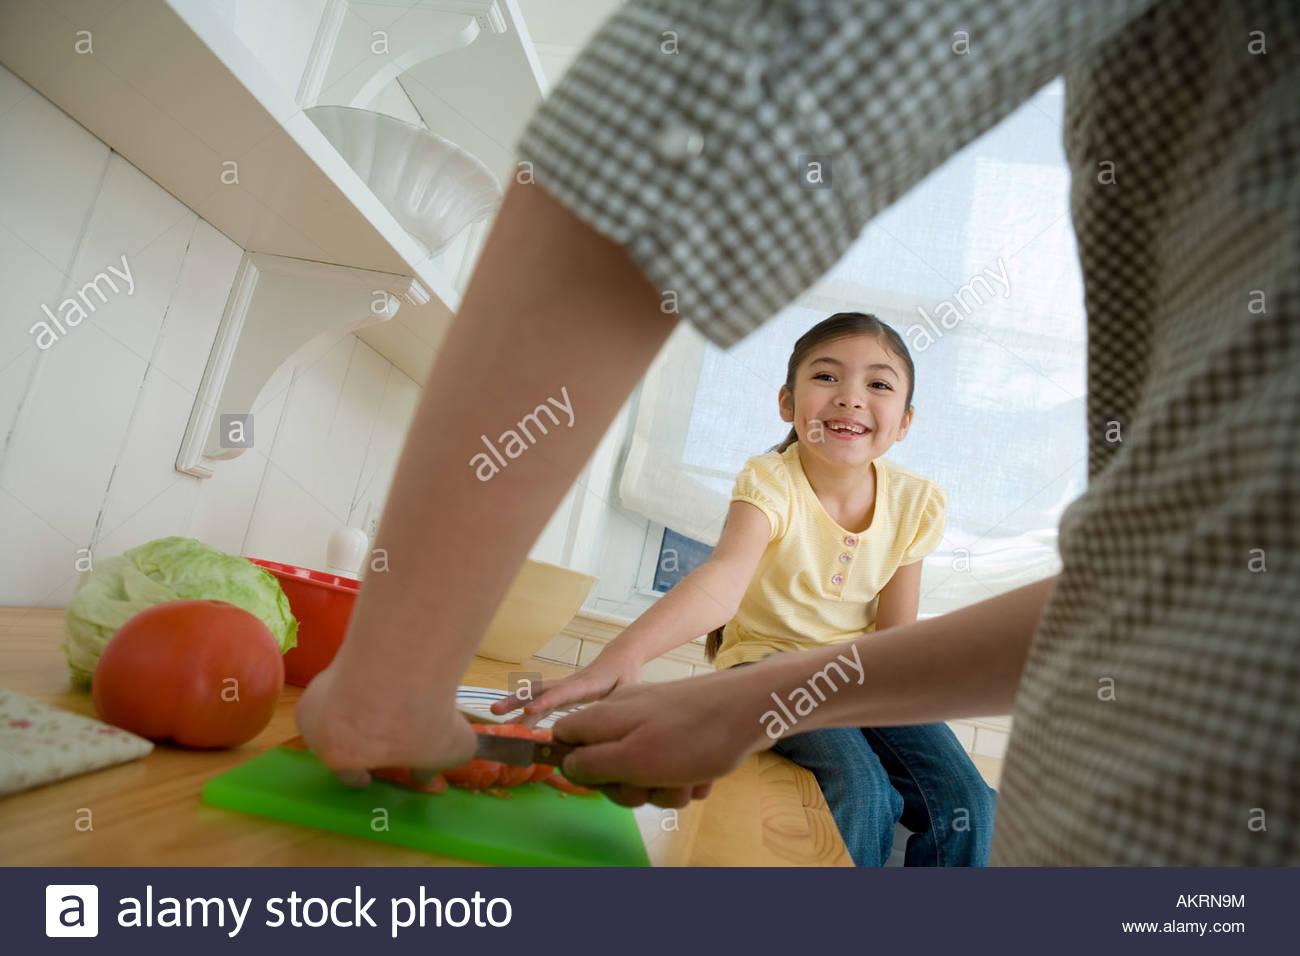 Una chica se sentó sobre una encimera Imagen De Stock